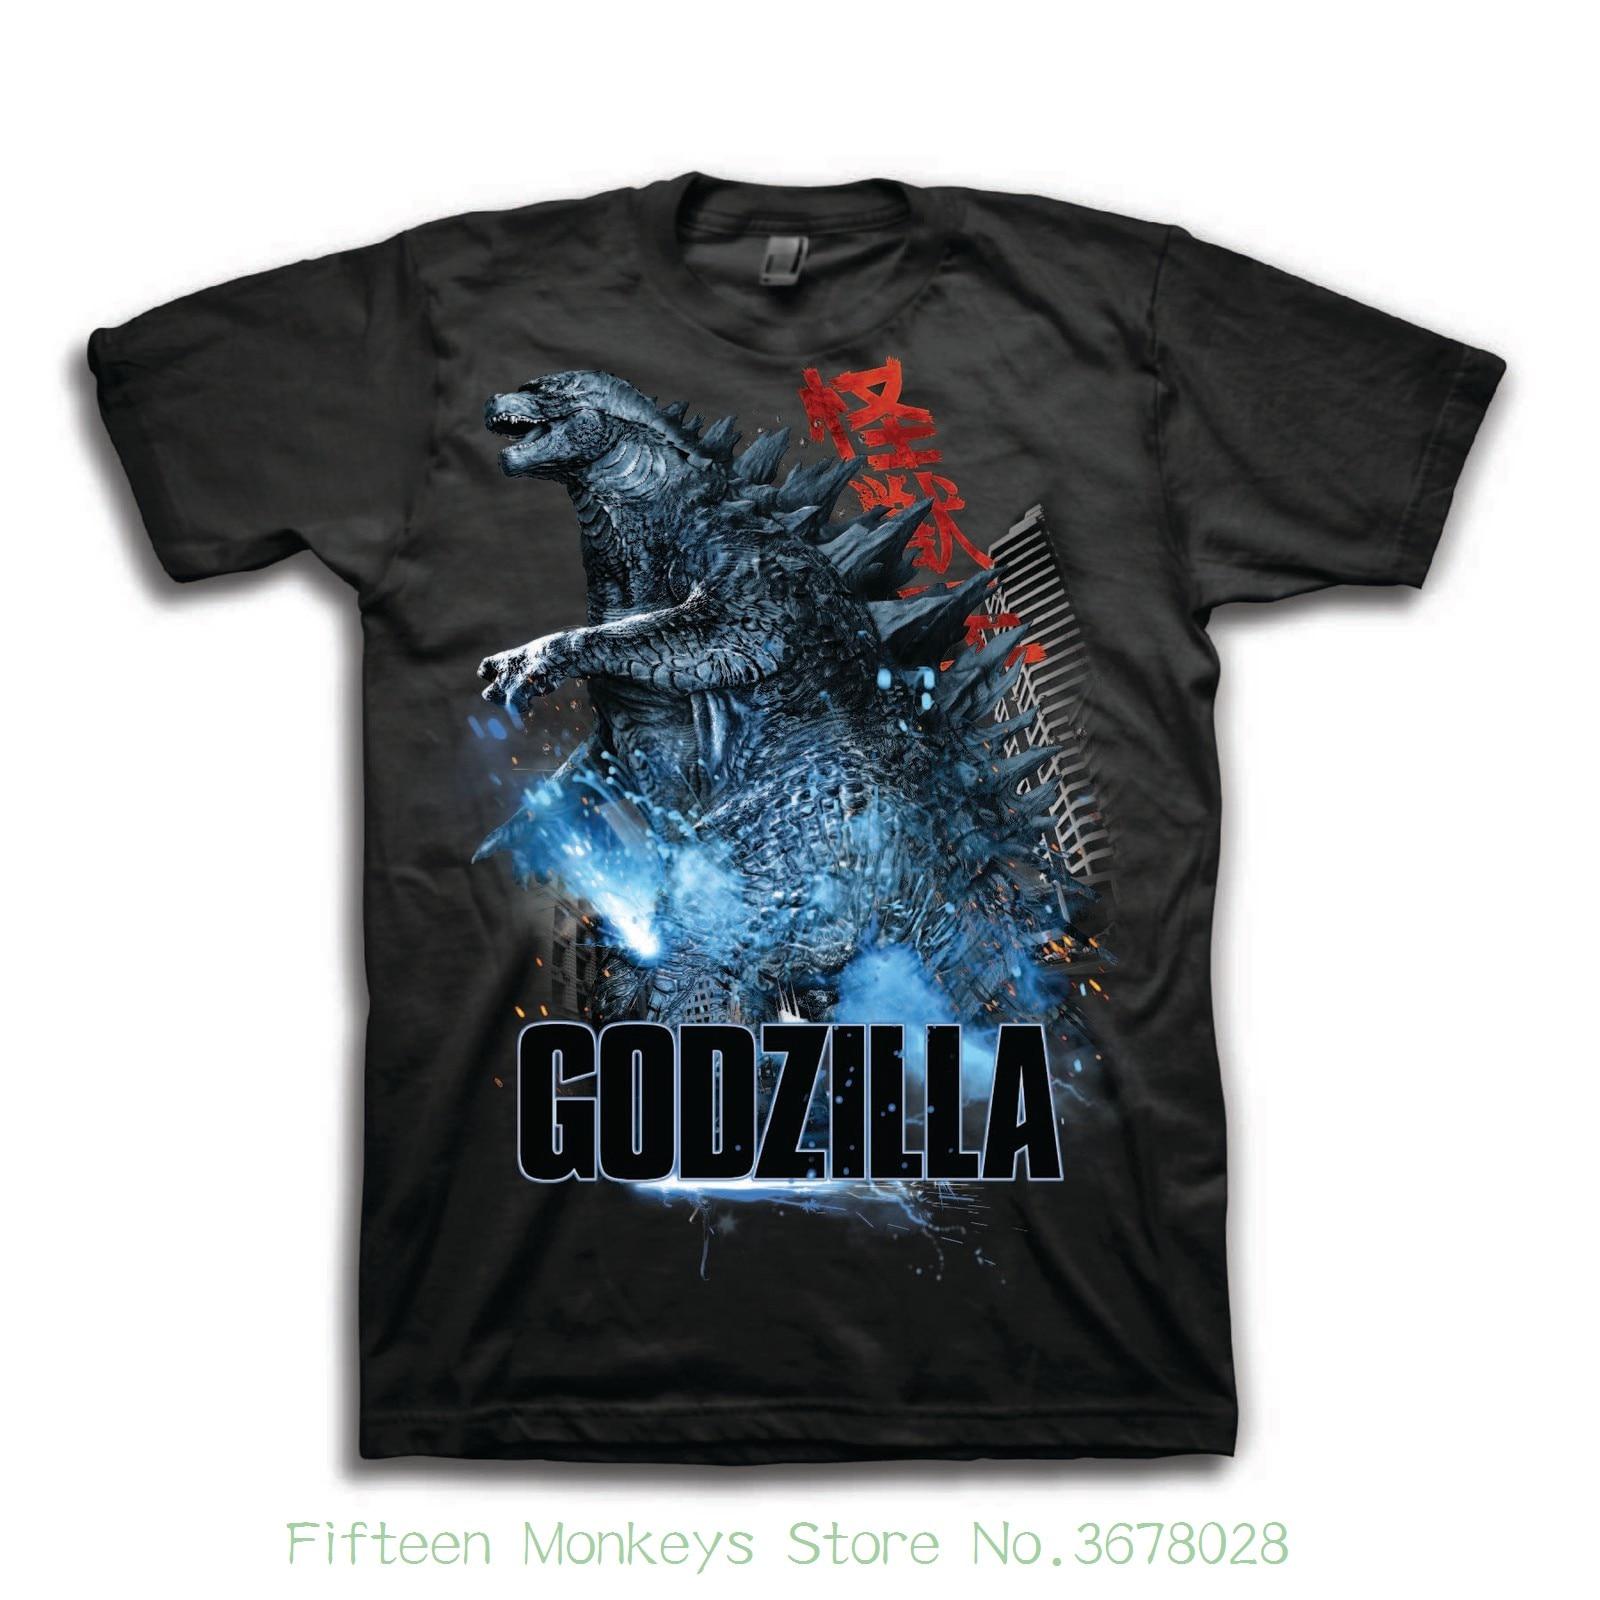 O Neck T-shirts Male Low Price Steampunk Godzilla Mens Destruction Shot Short Sleeve Graphic T-shirt